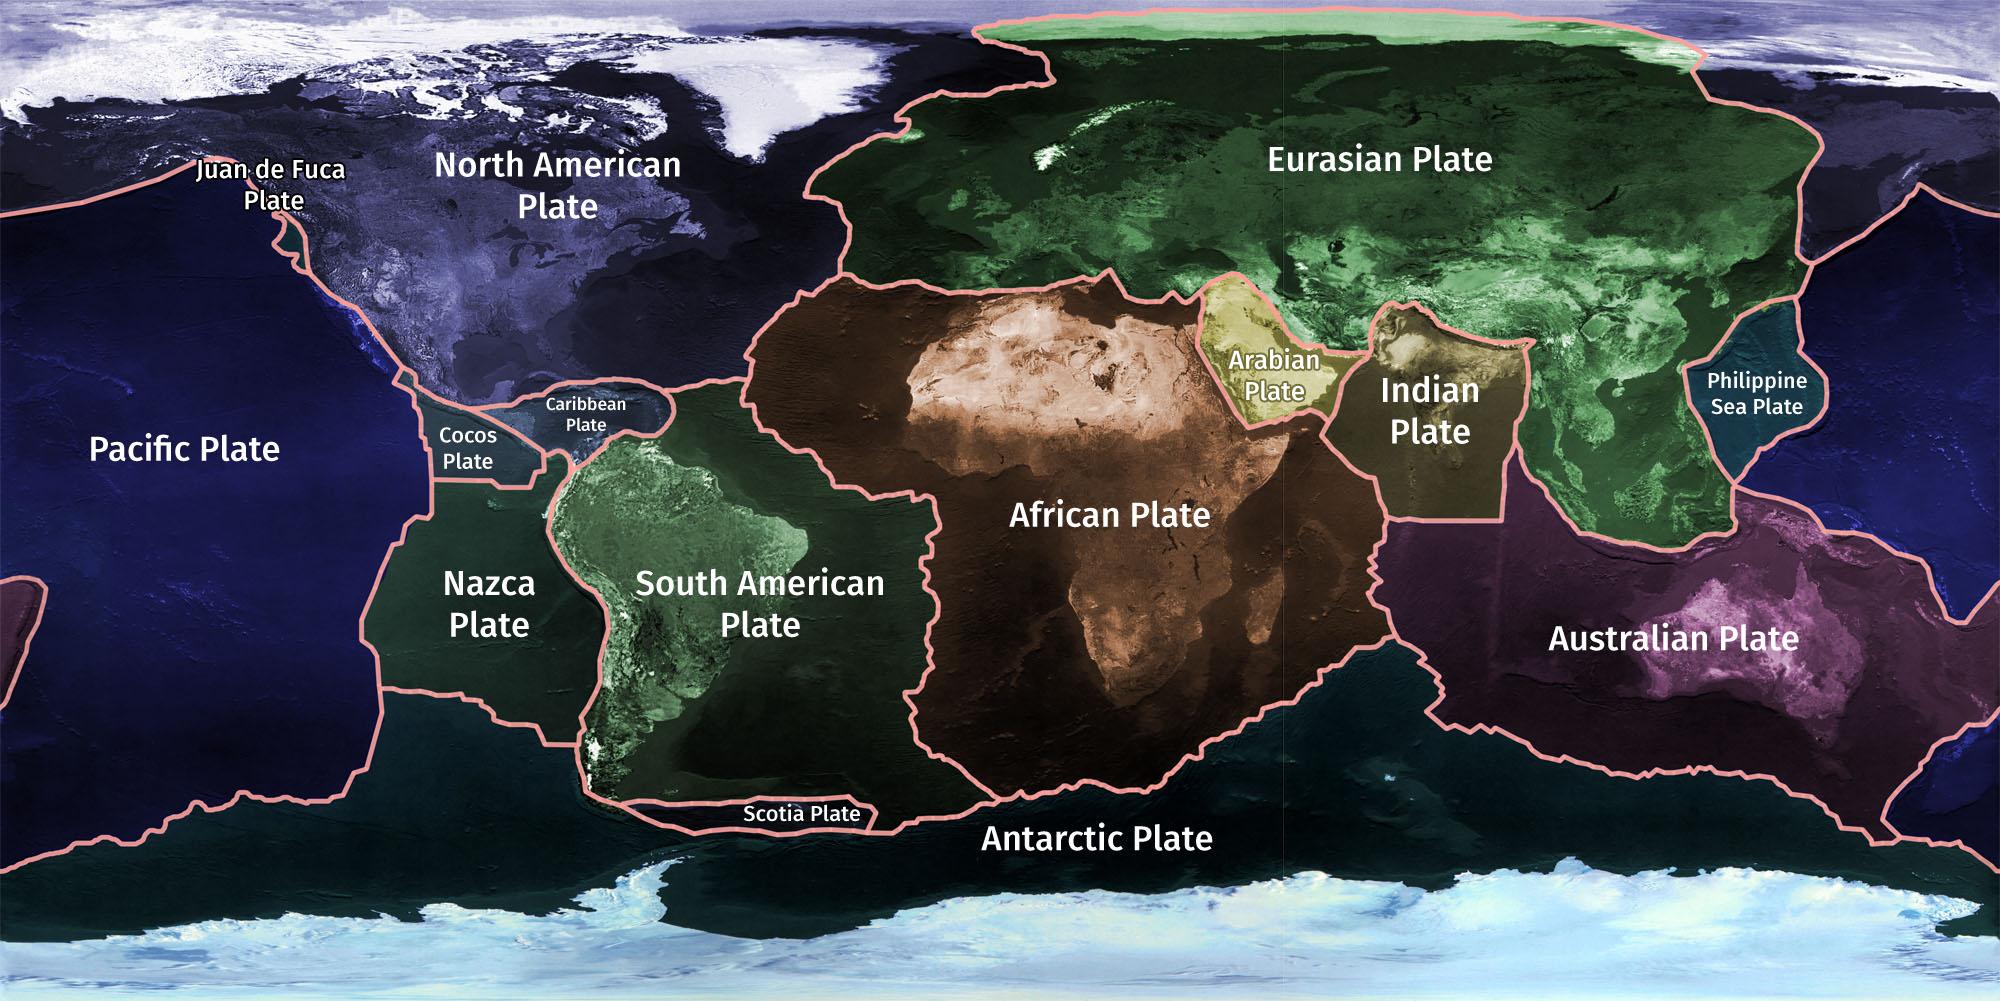 #026 Tectonics plates